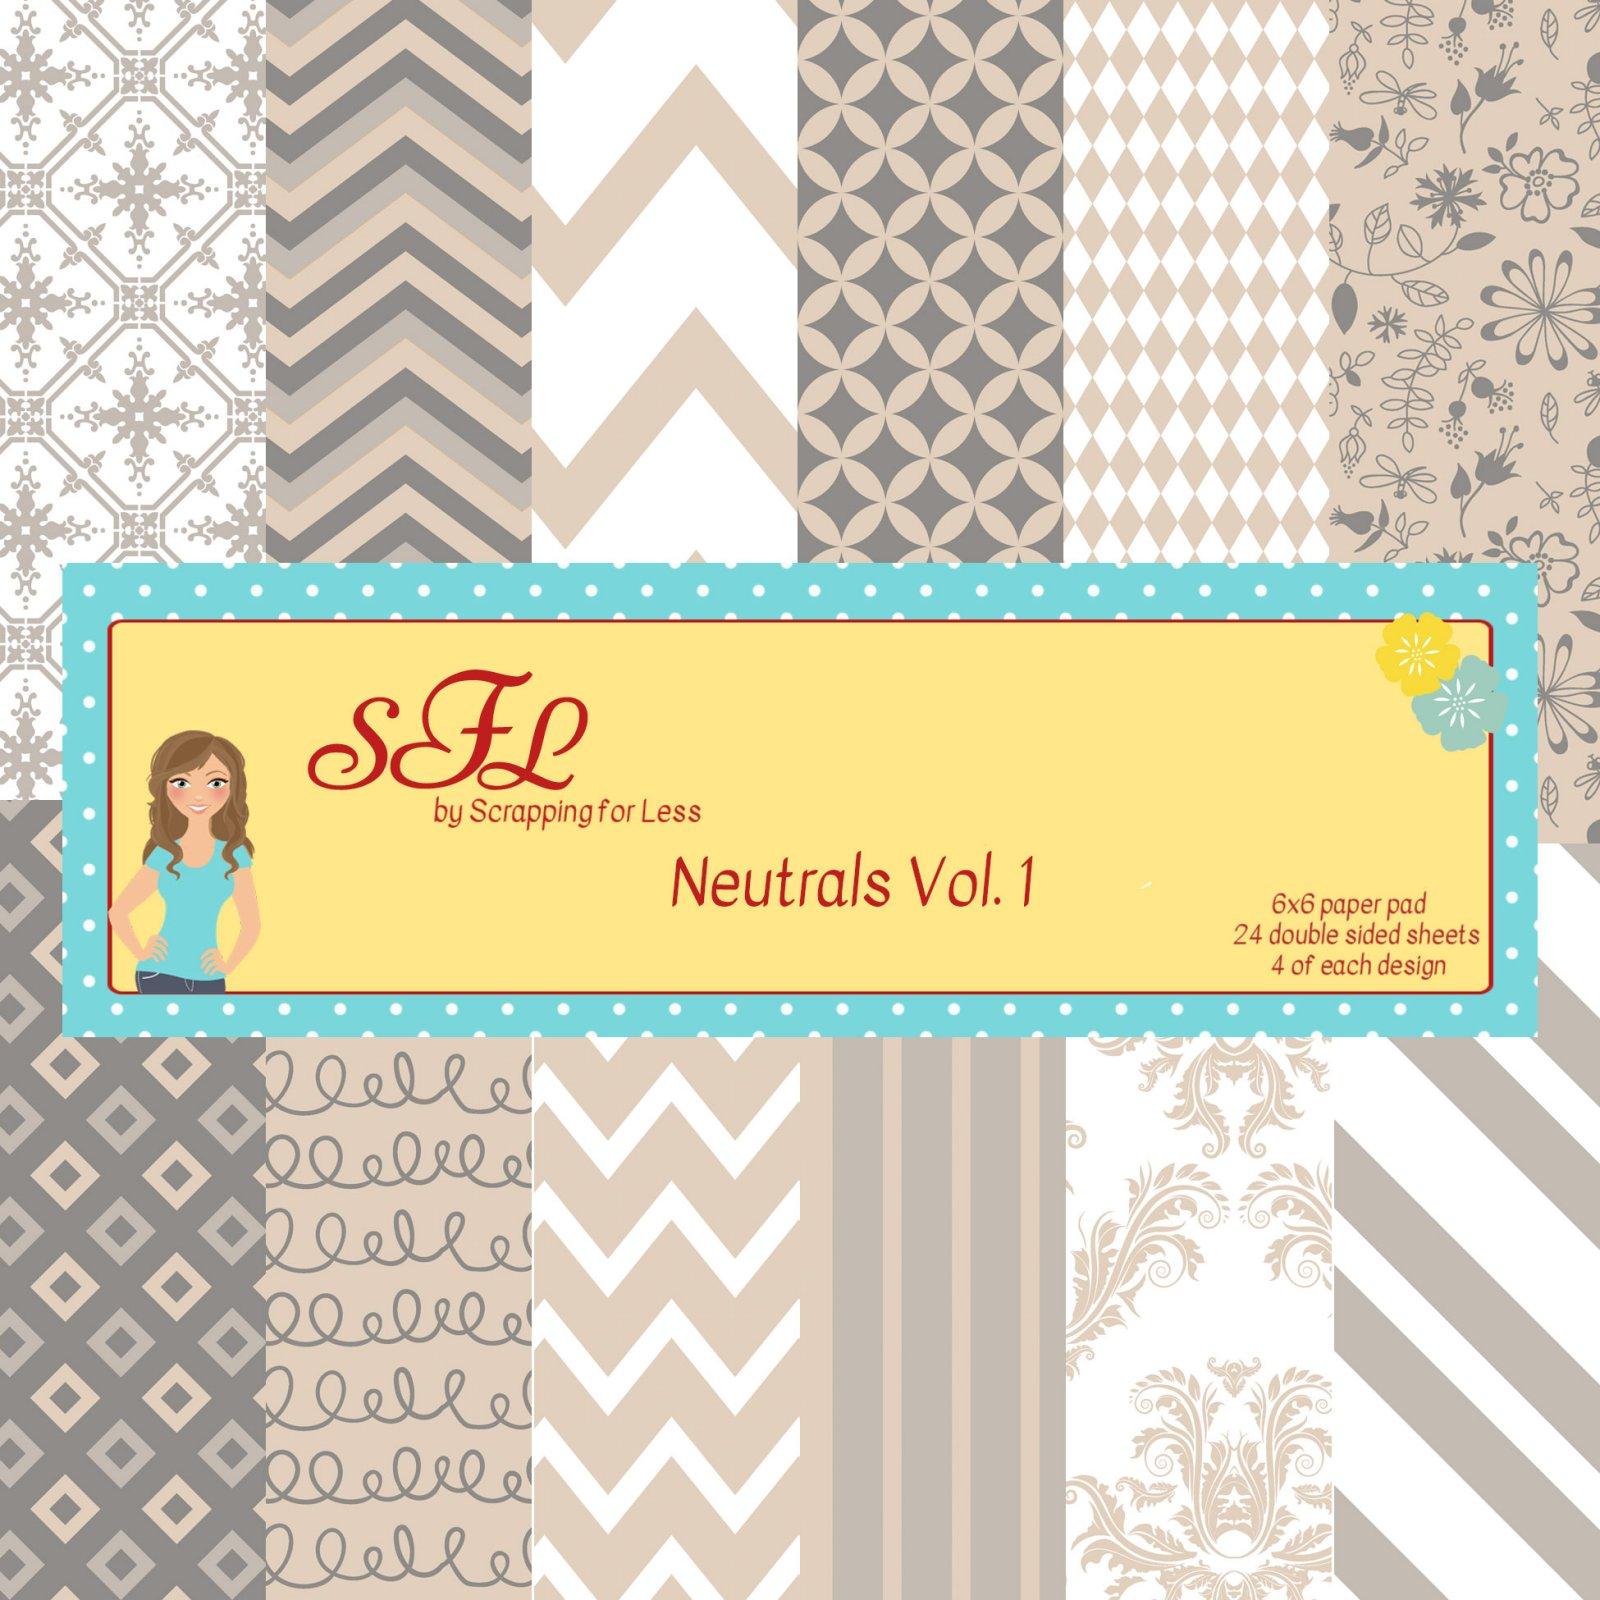 SFL Neutrals Vol. 1 6x6 Paper Pad